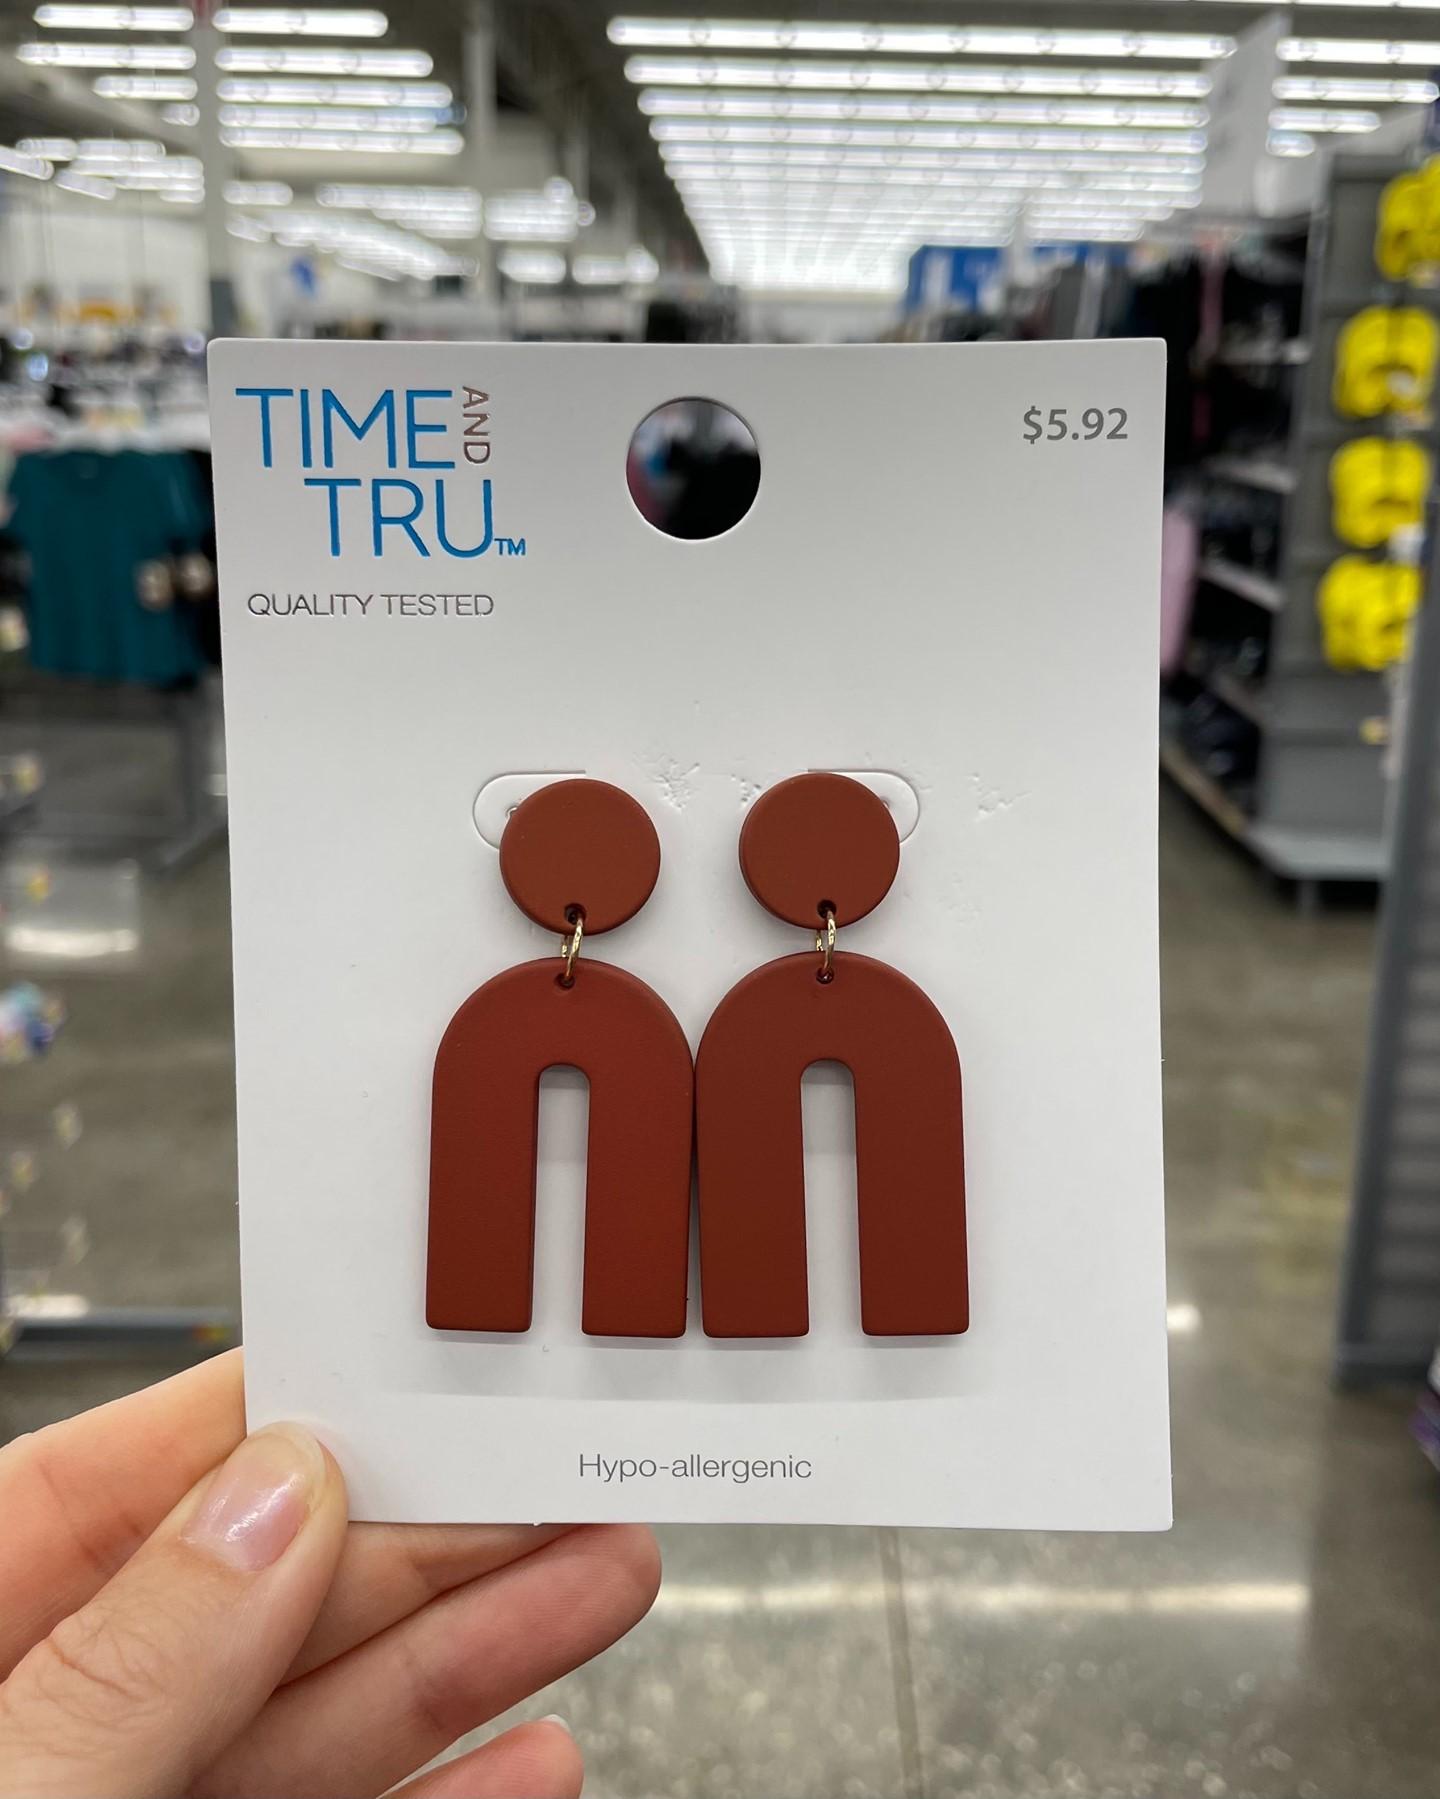 Time and Tru Quality Tested U Earrings